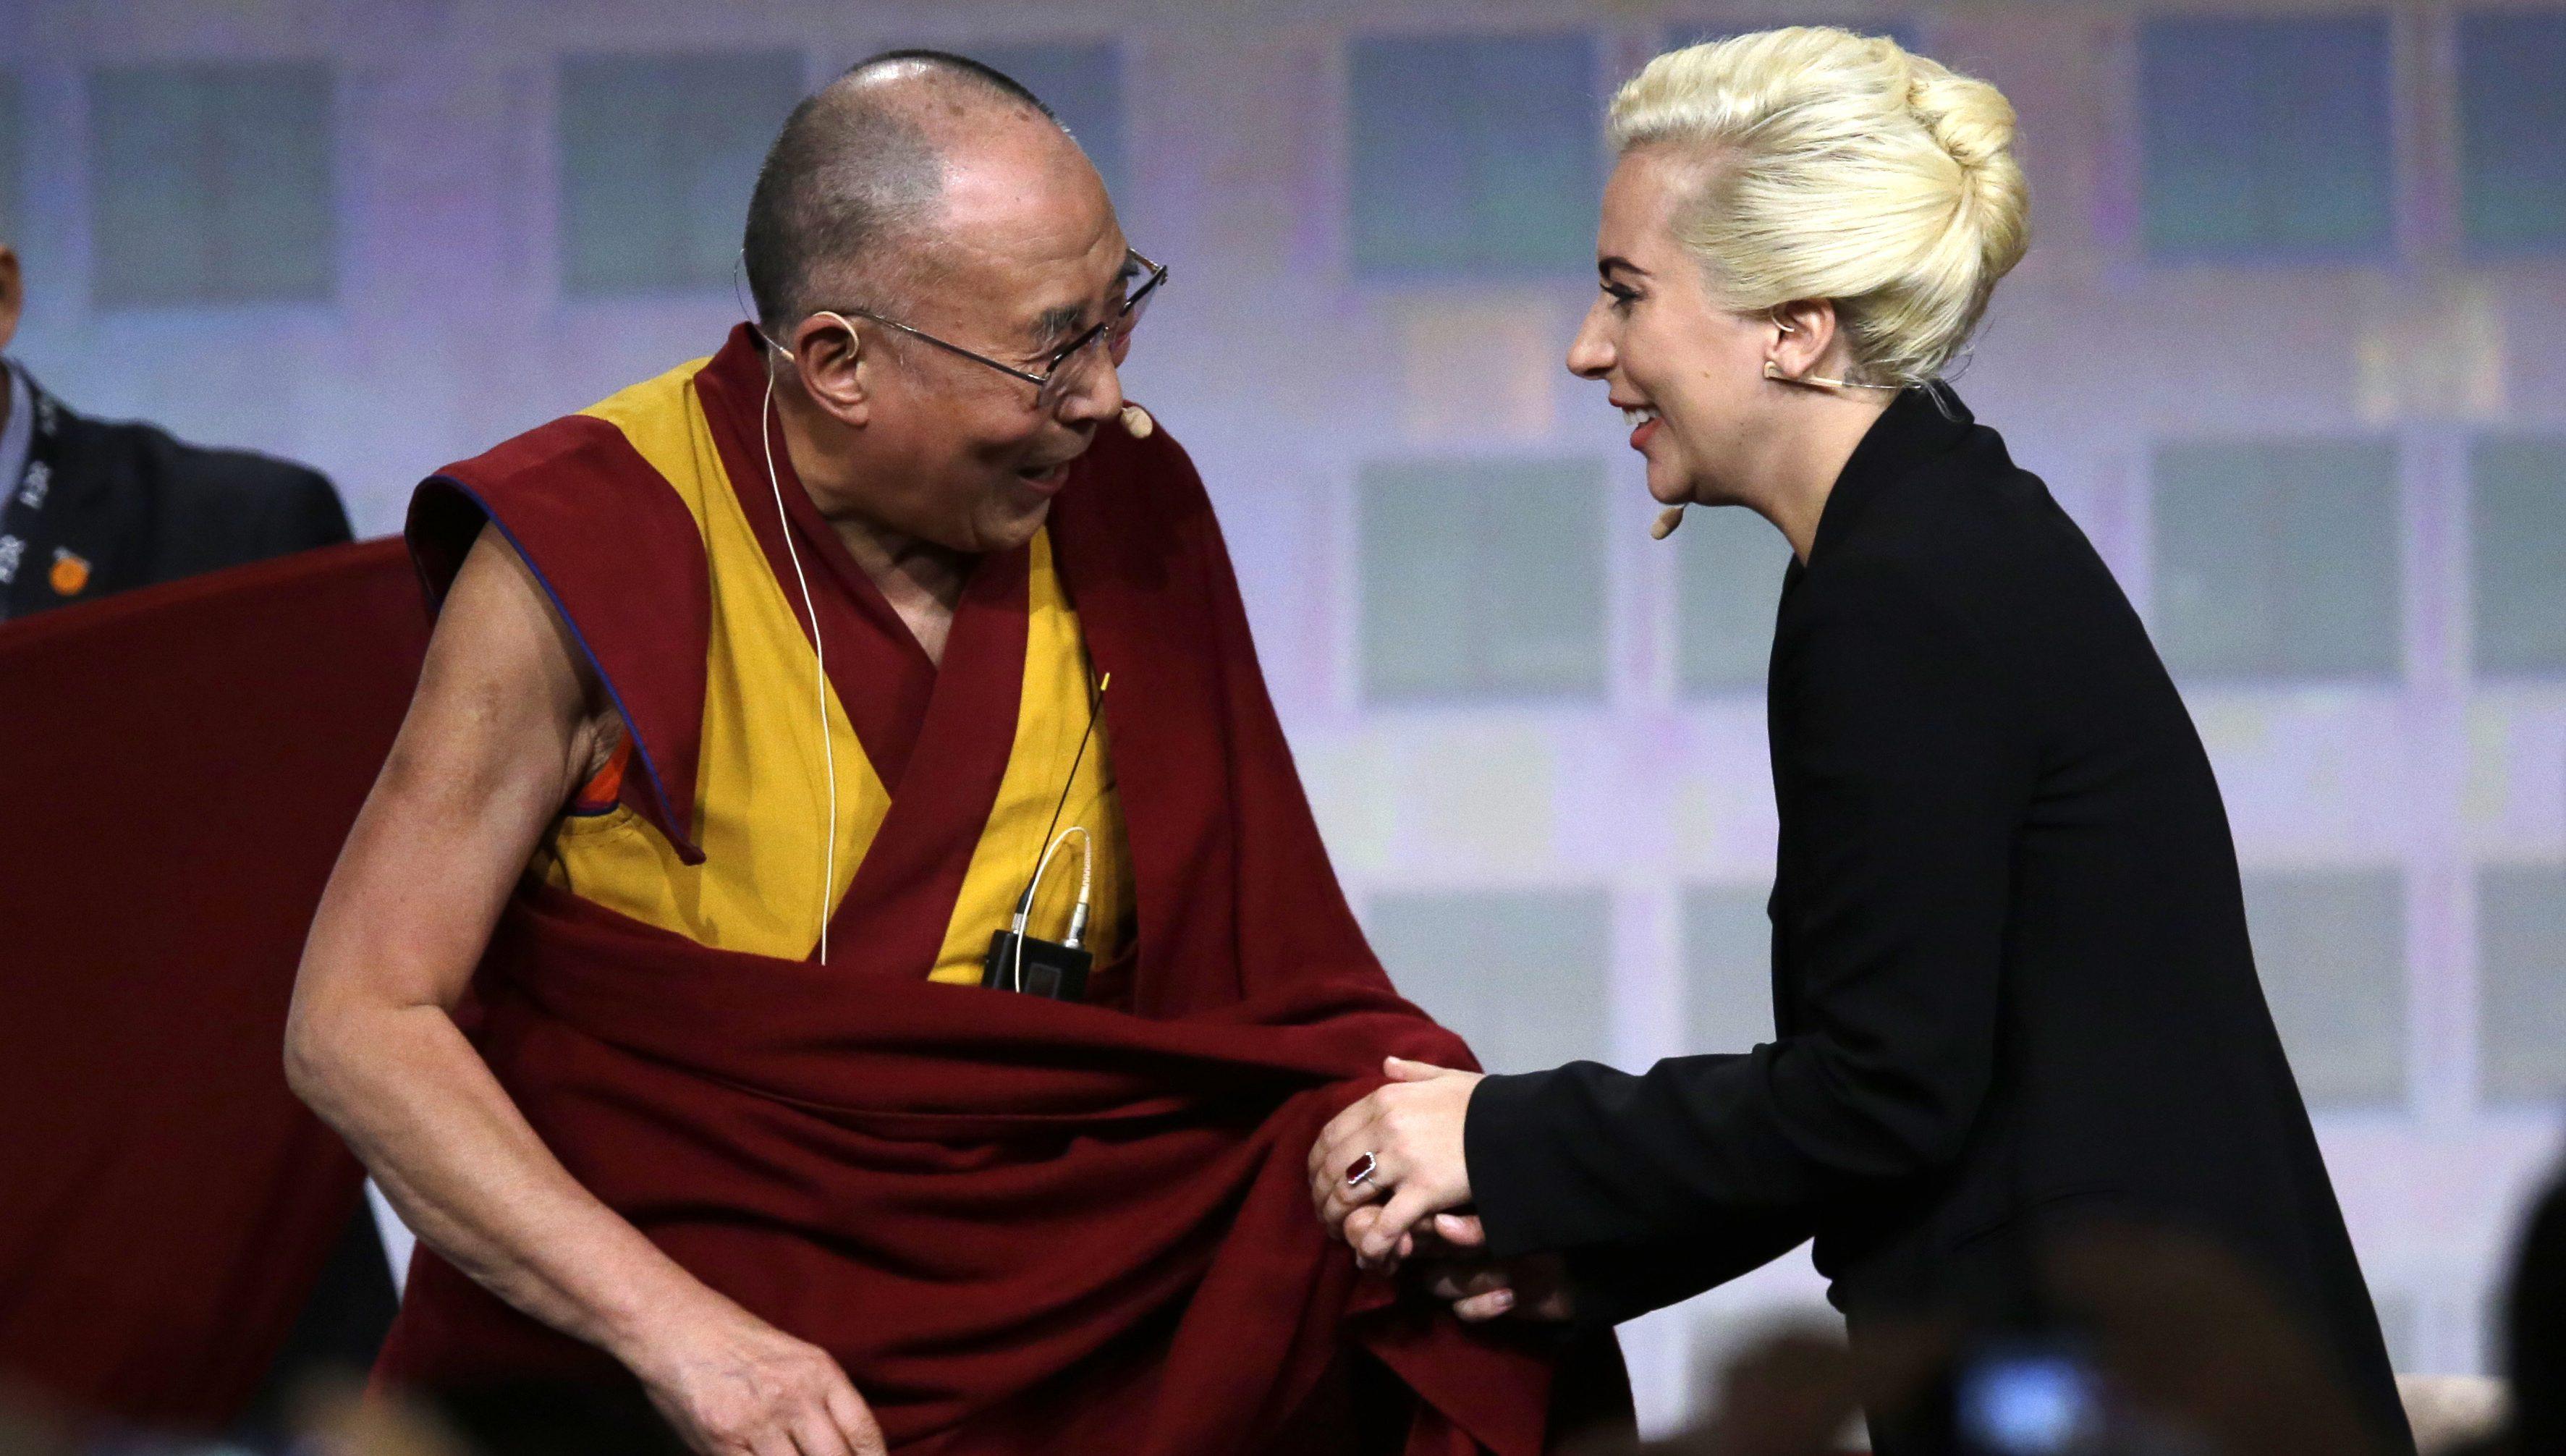 Lady Gaga has hurt Chinese people's feelings. (AP Photo/Michael Conroy)